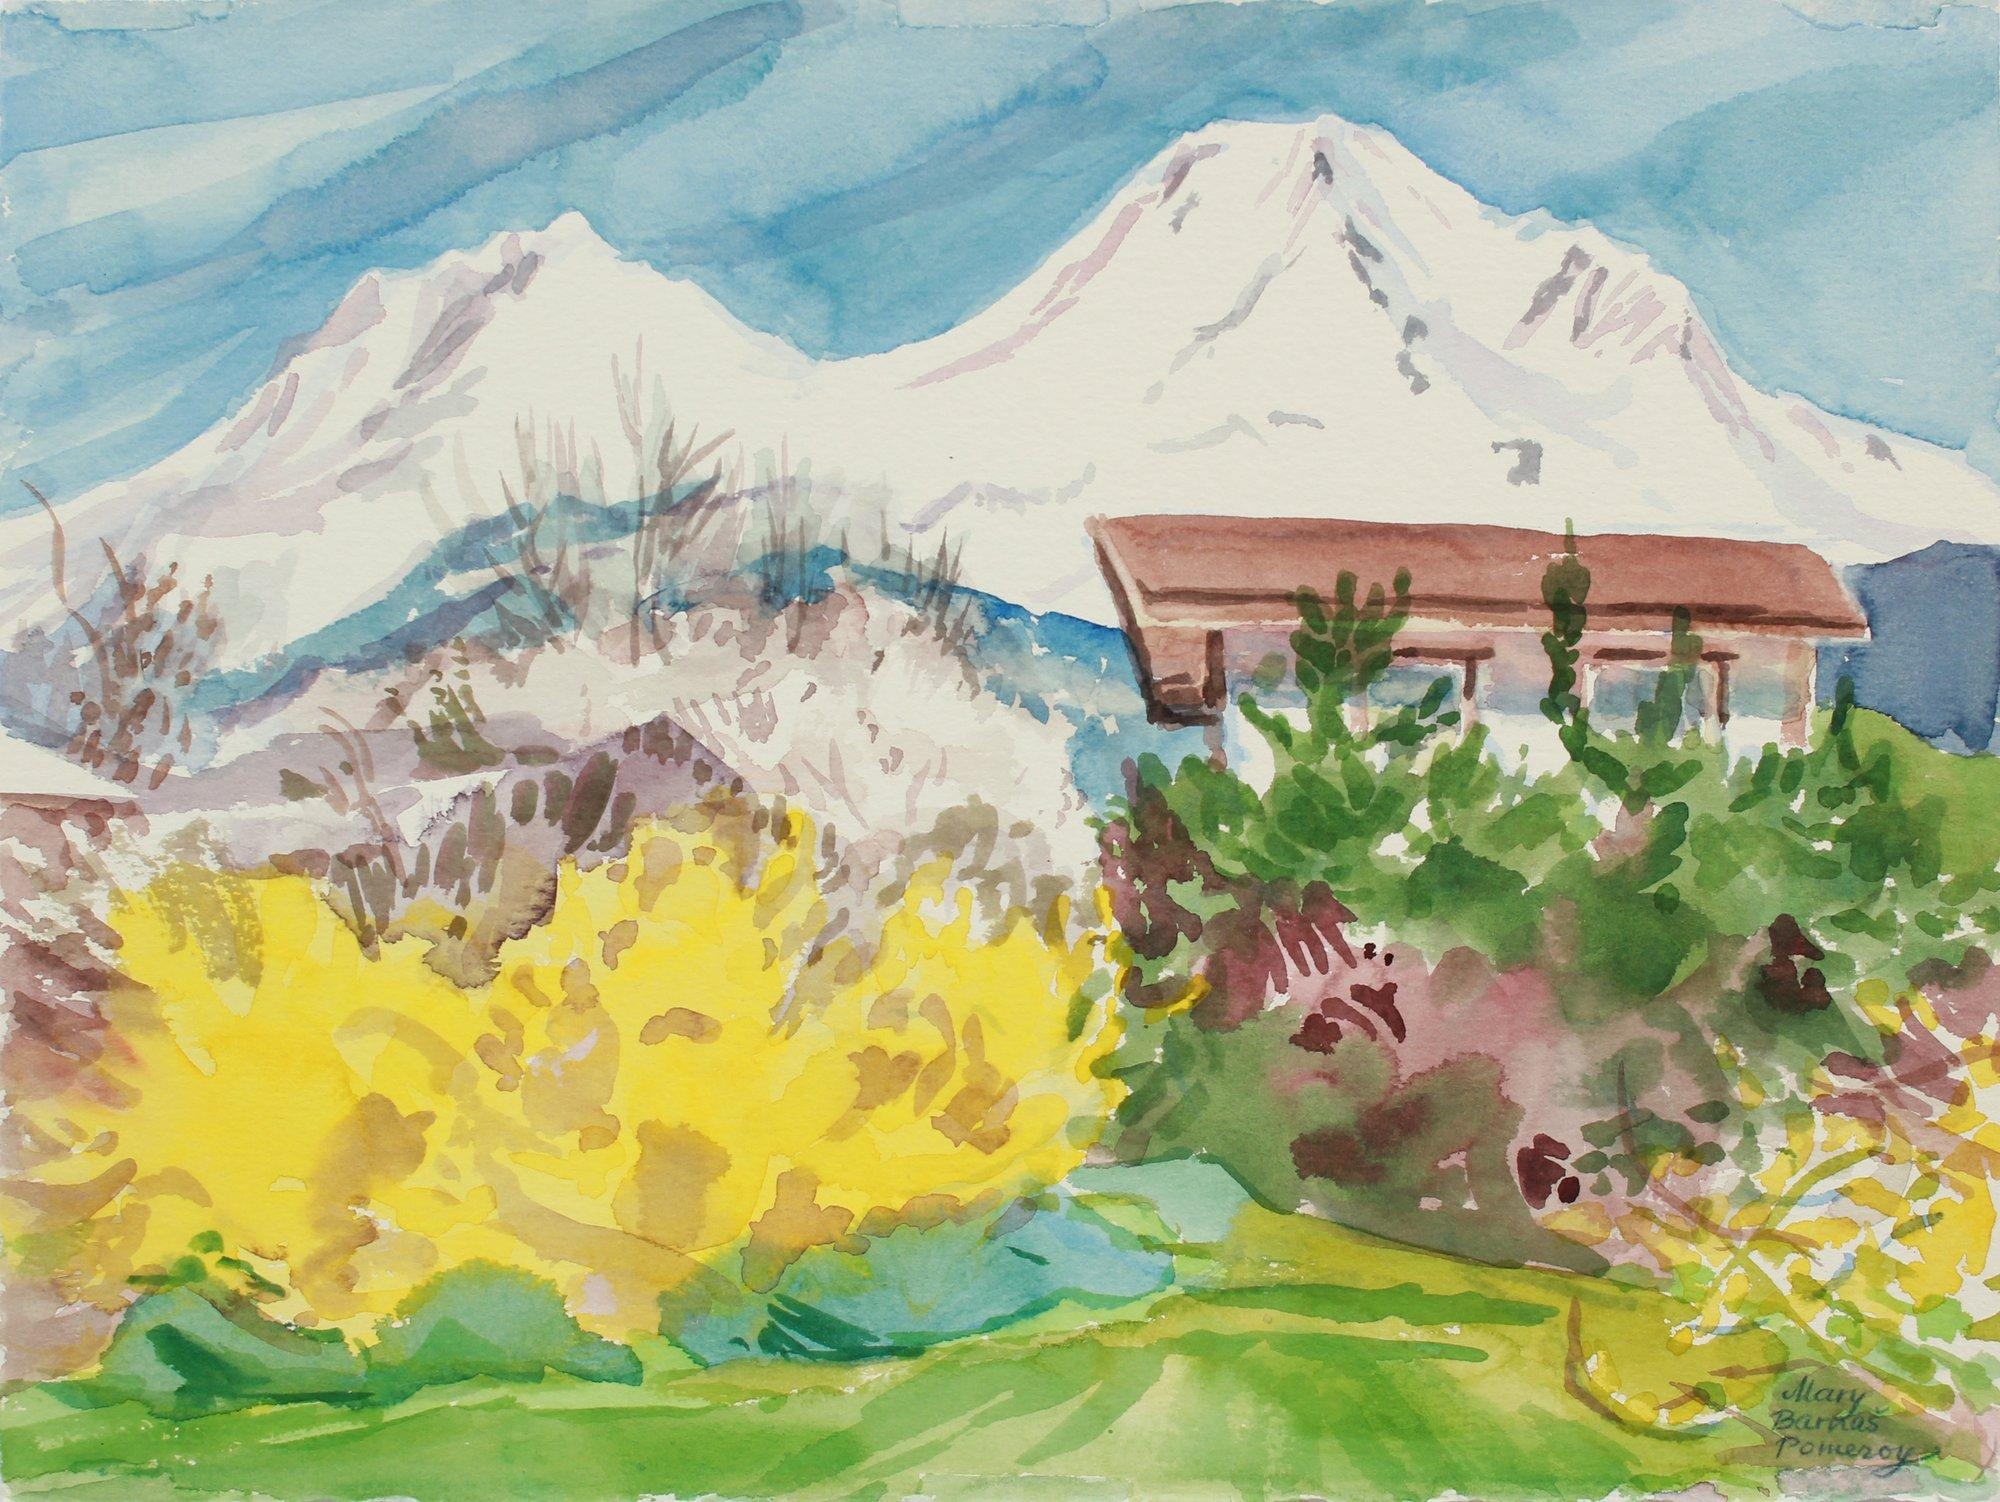 """Mt. Shastina (left) and Mt. Shasta (right)"" April 30, 1999 Watercolor Landscape"